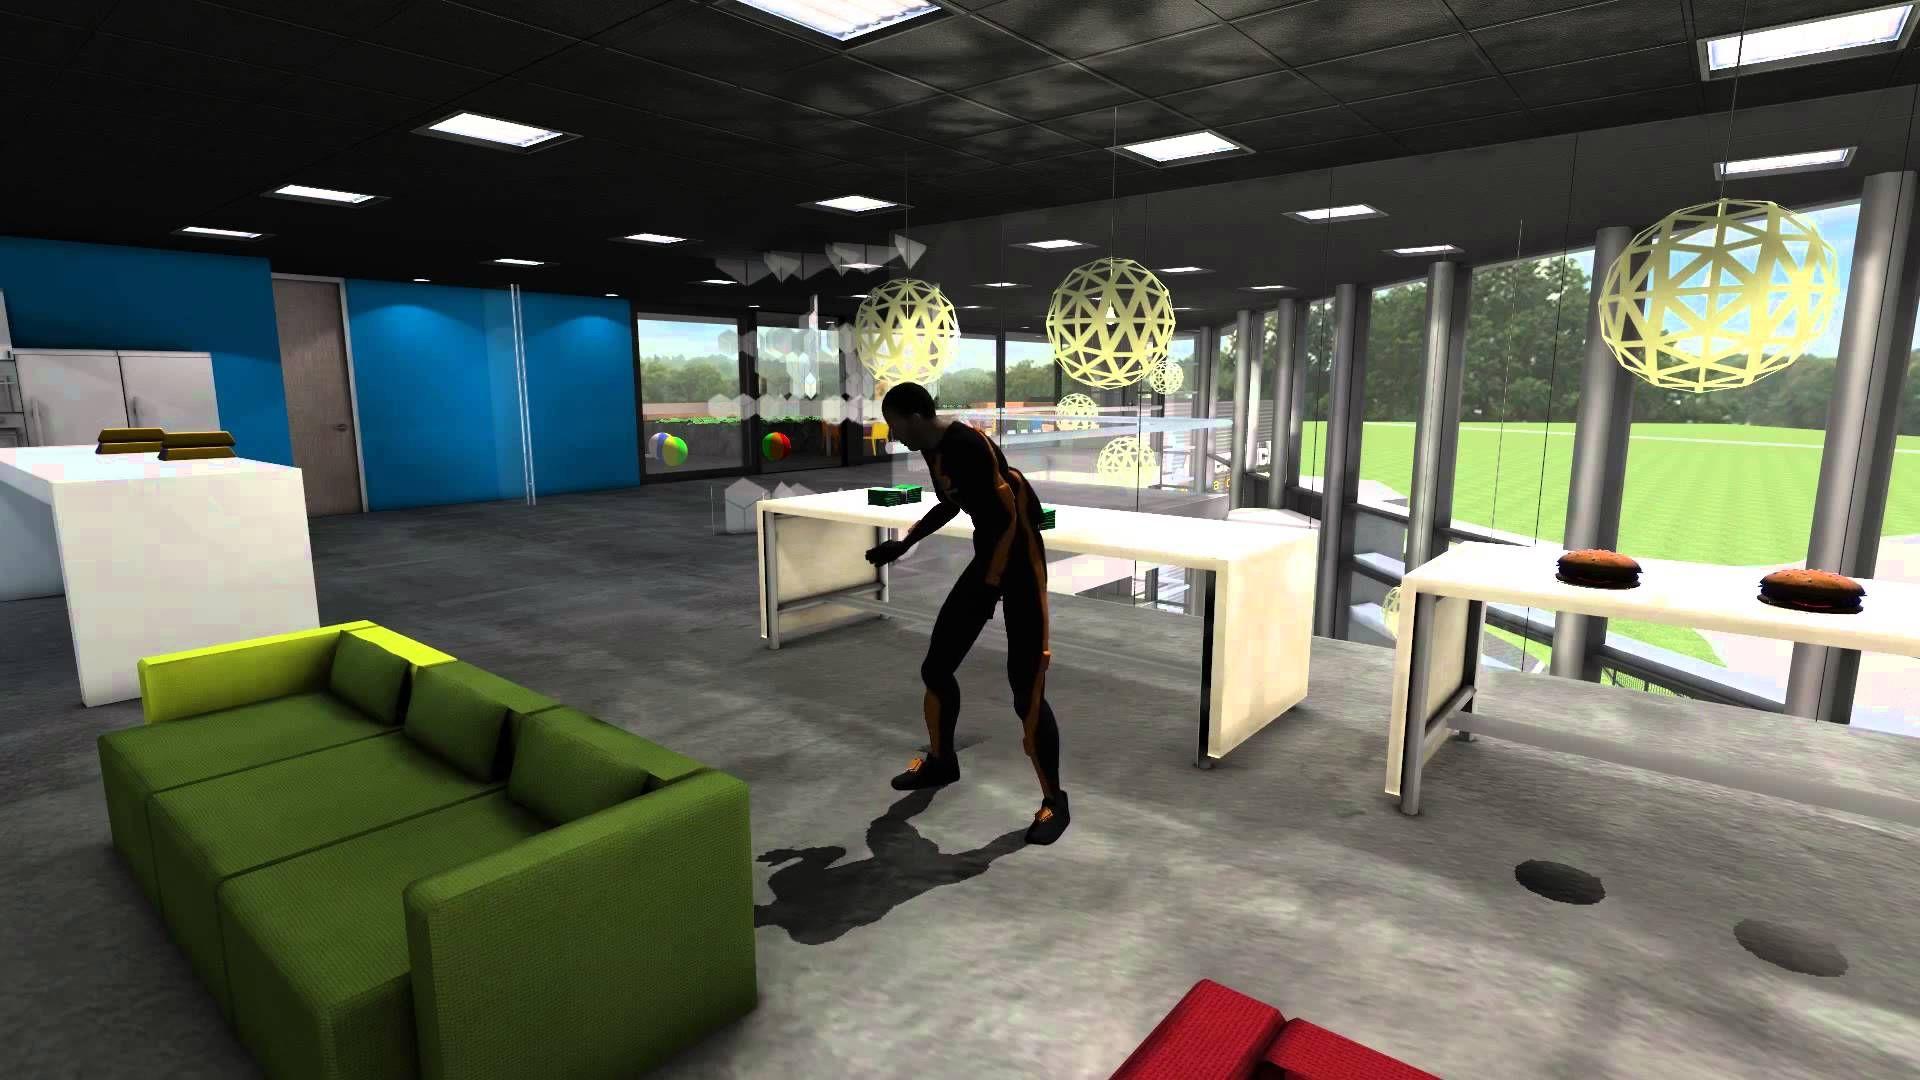 Oculus Rift + Xsens Motion Capture + Unity 3D  Many projects